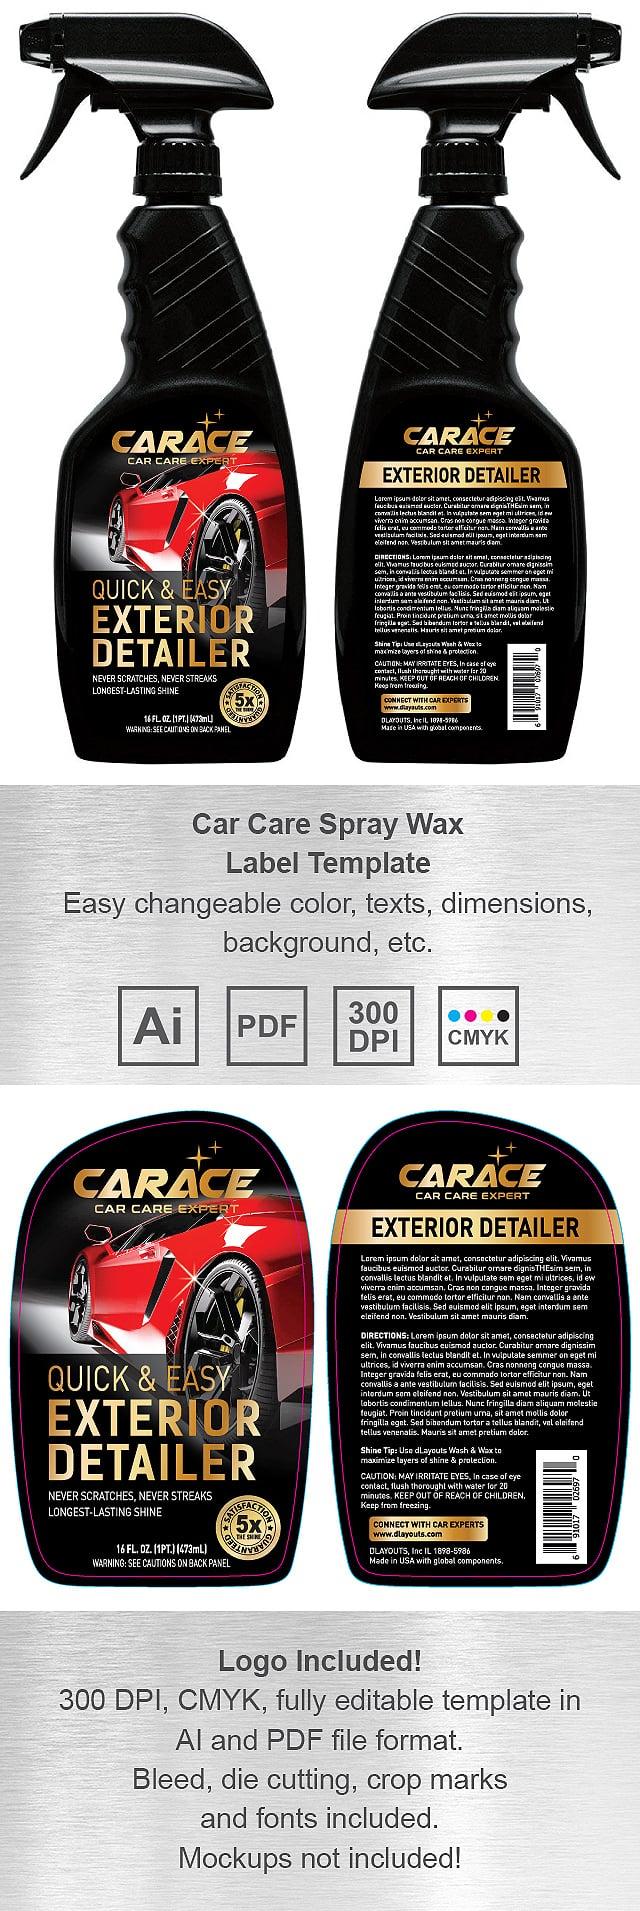 Exterior Detailer Label Template